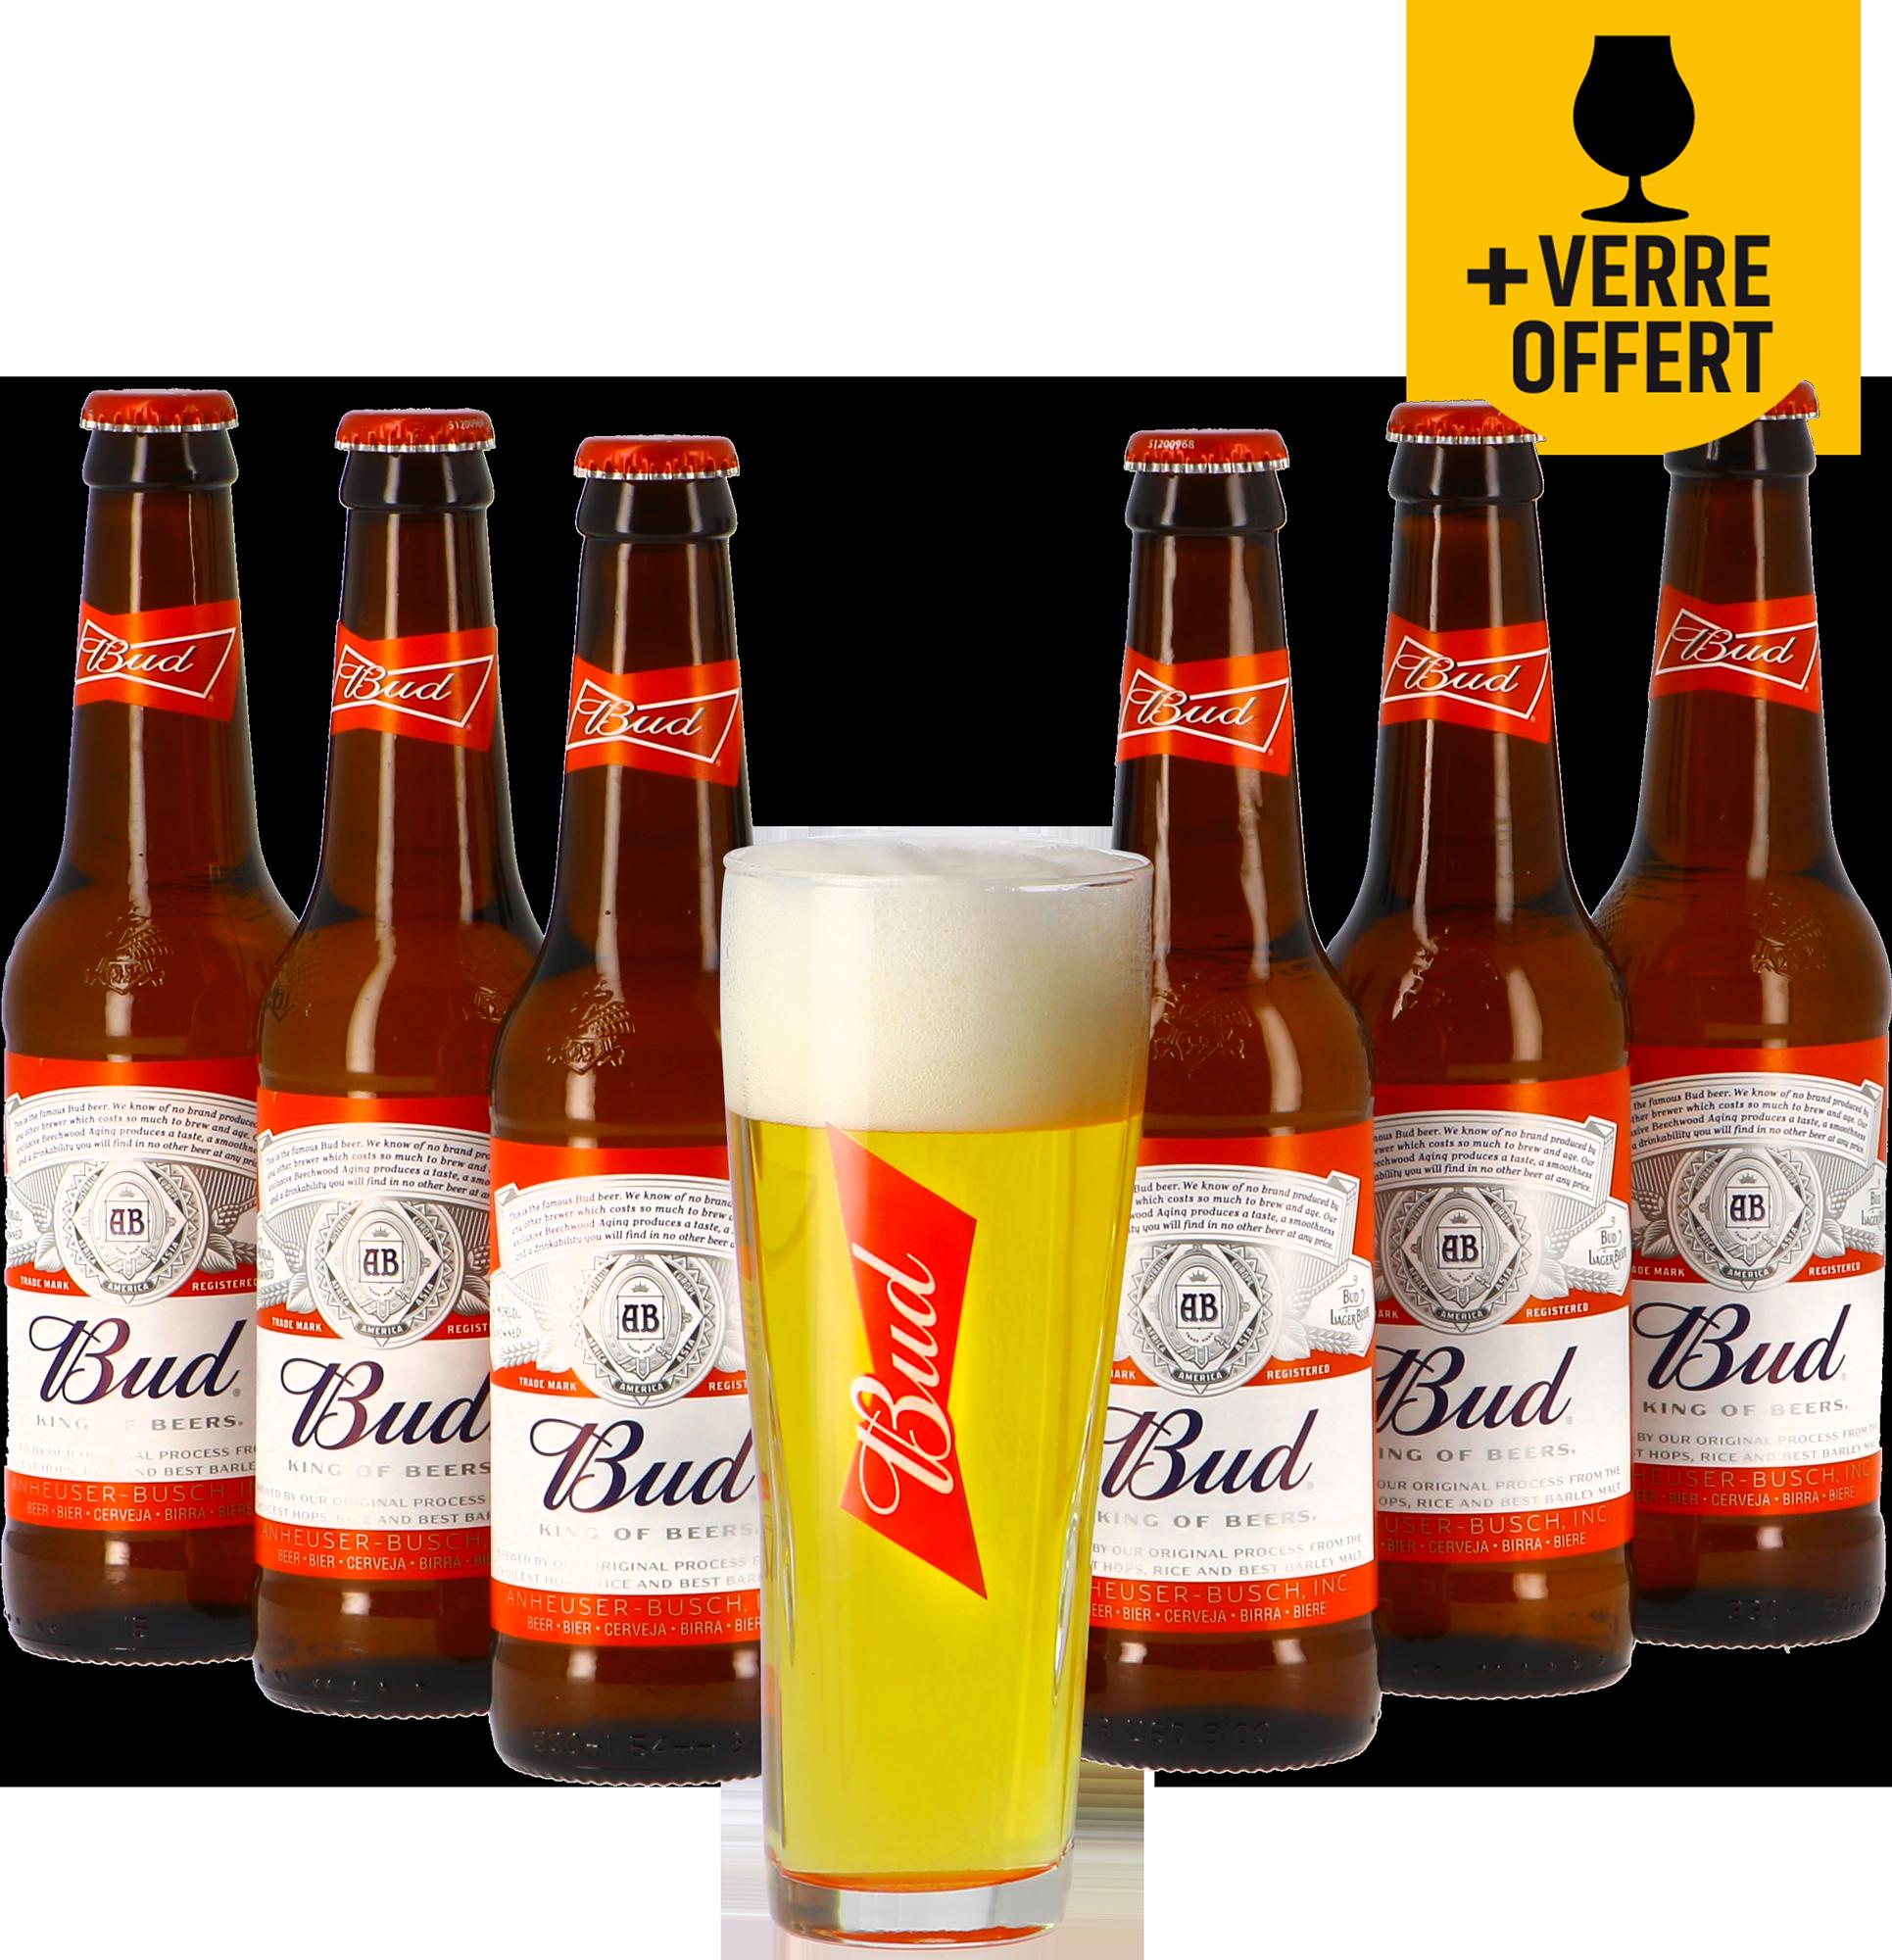 Budweiser Bud 6 pack + Vaso de cerveza Budweiser gratis